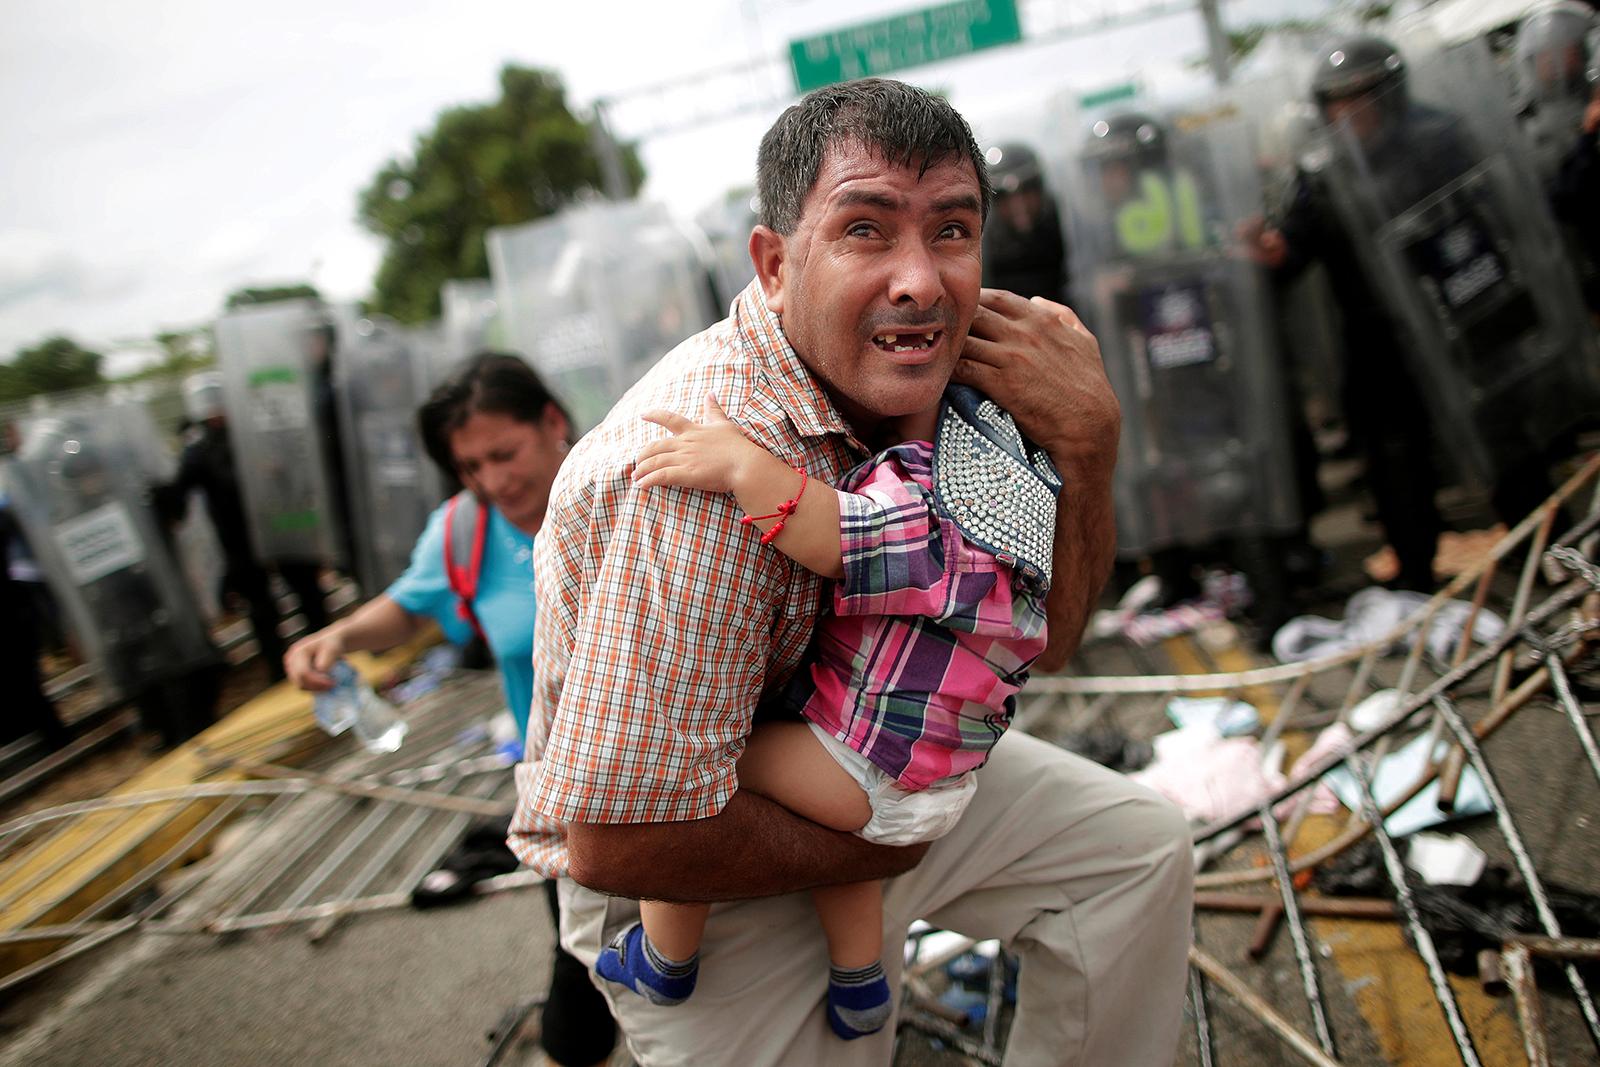 Migrants halted on bridge at Mexico border